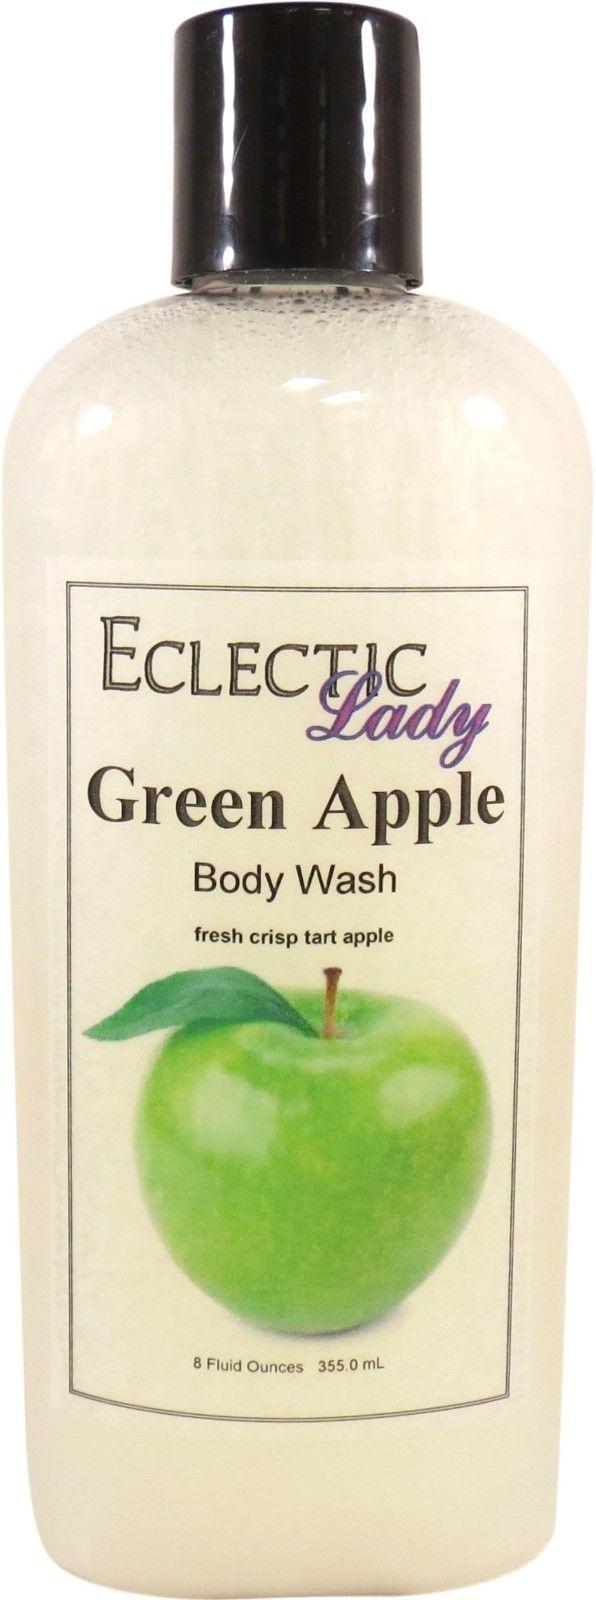 Green Apple Body Wash